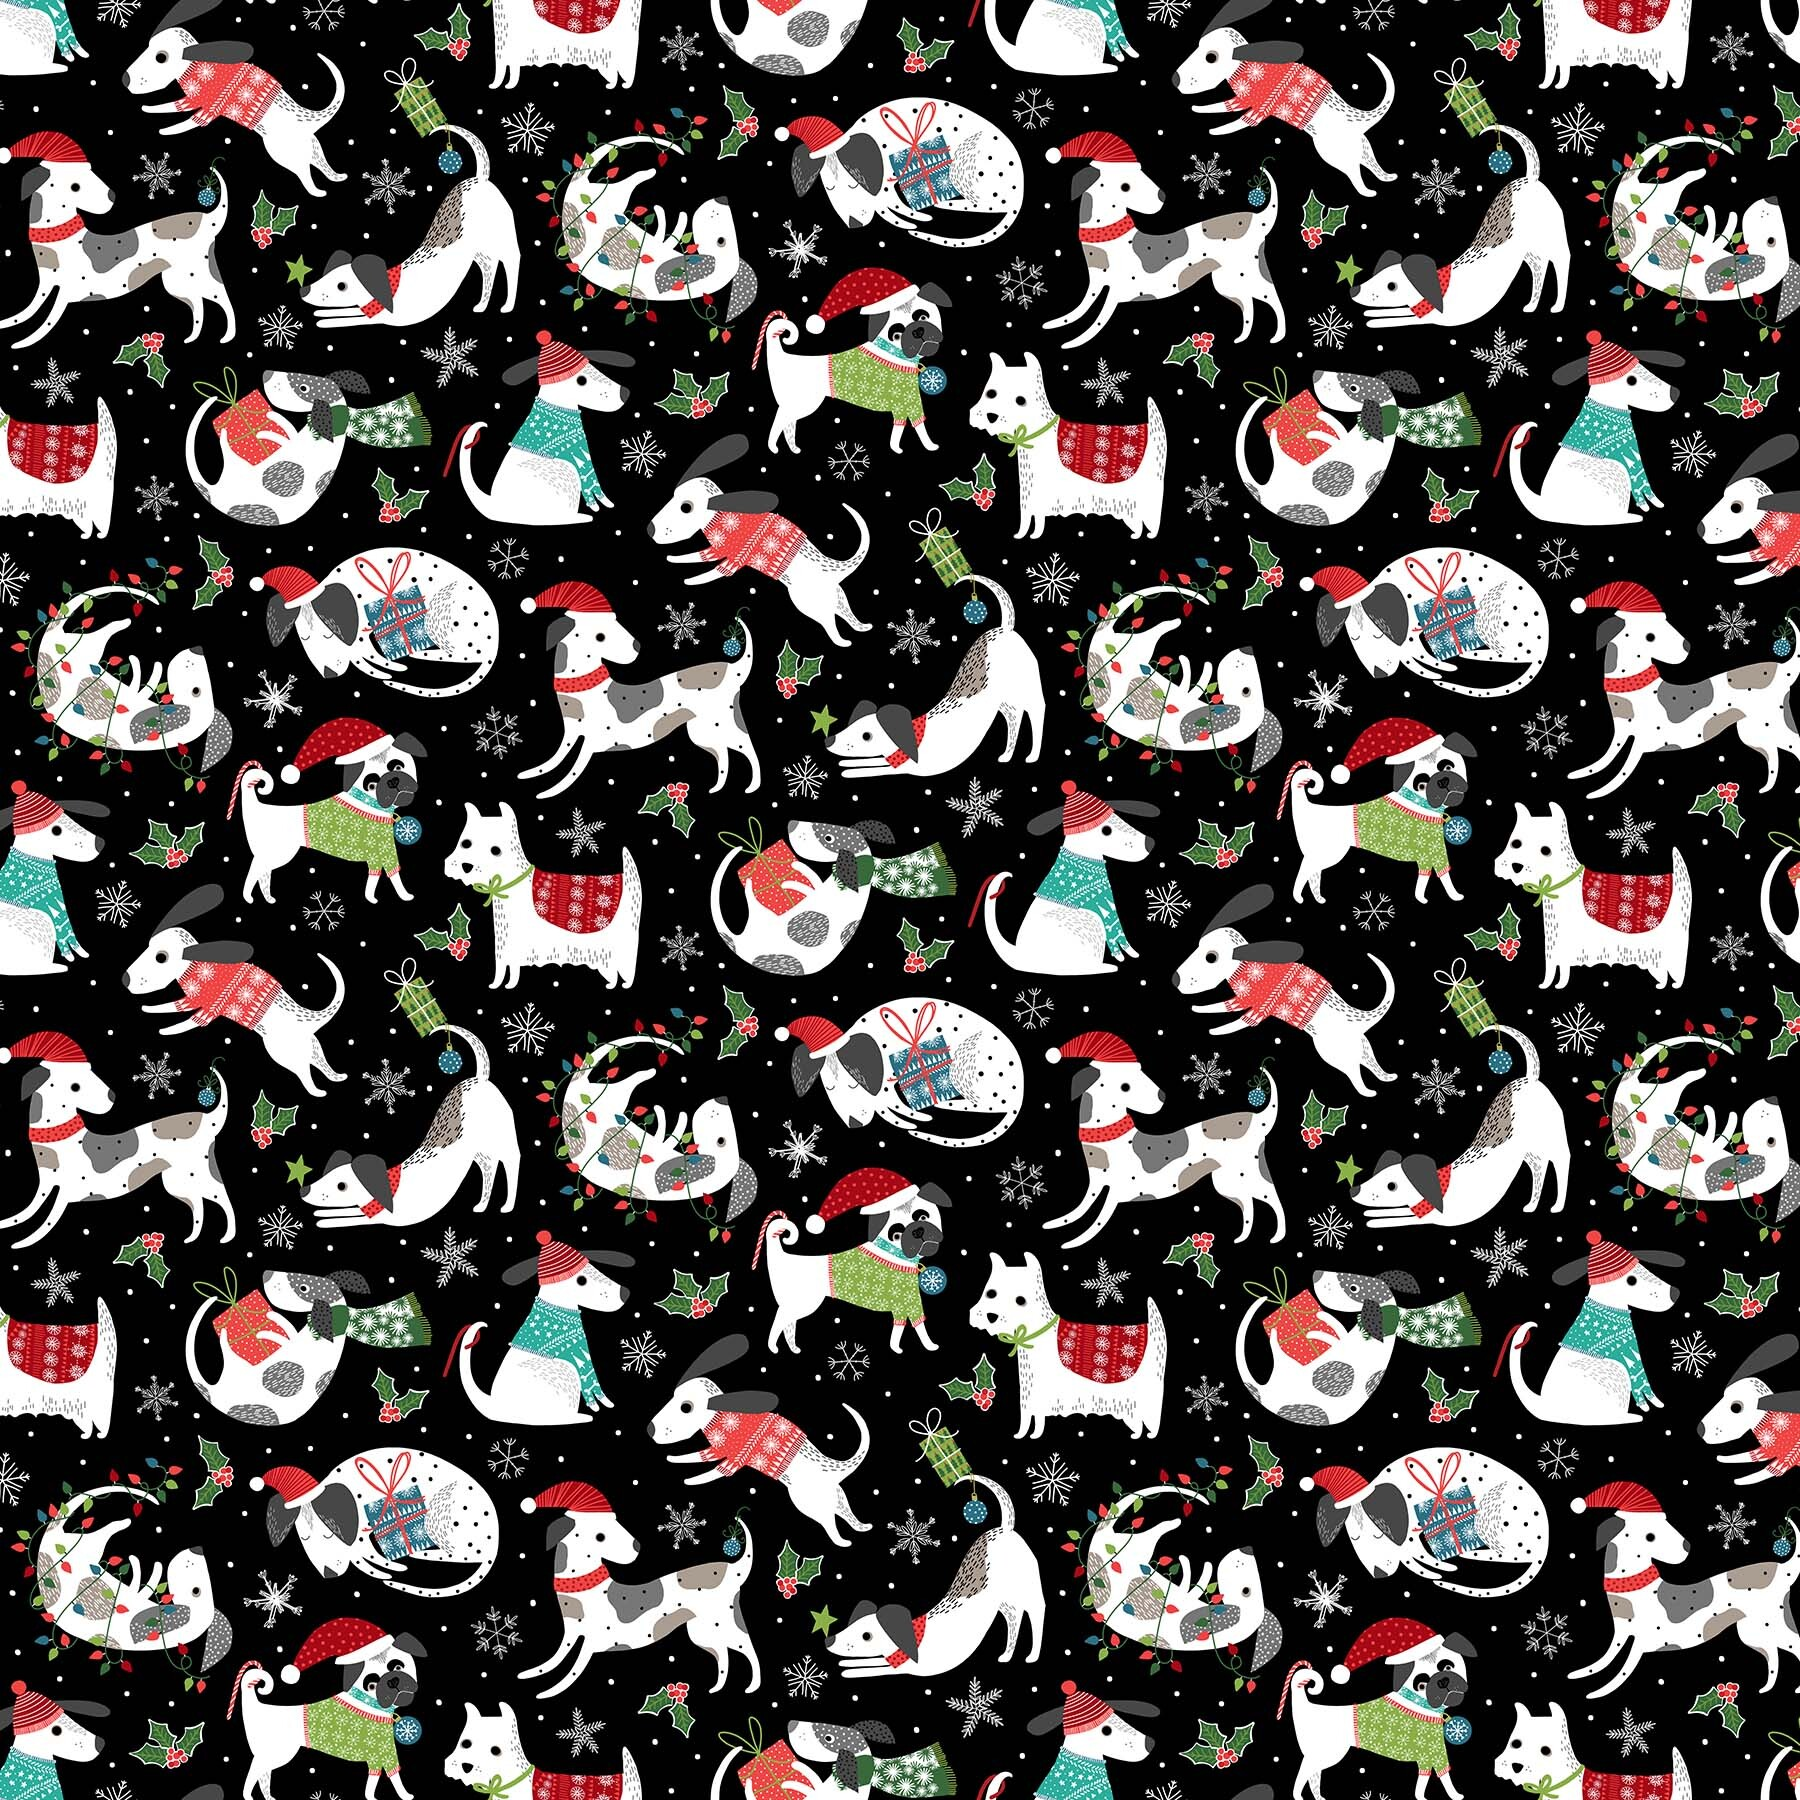 Santa Paws - Black Allover Dogs - 1/2m cut 58023